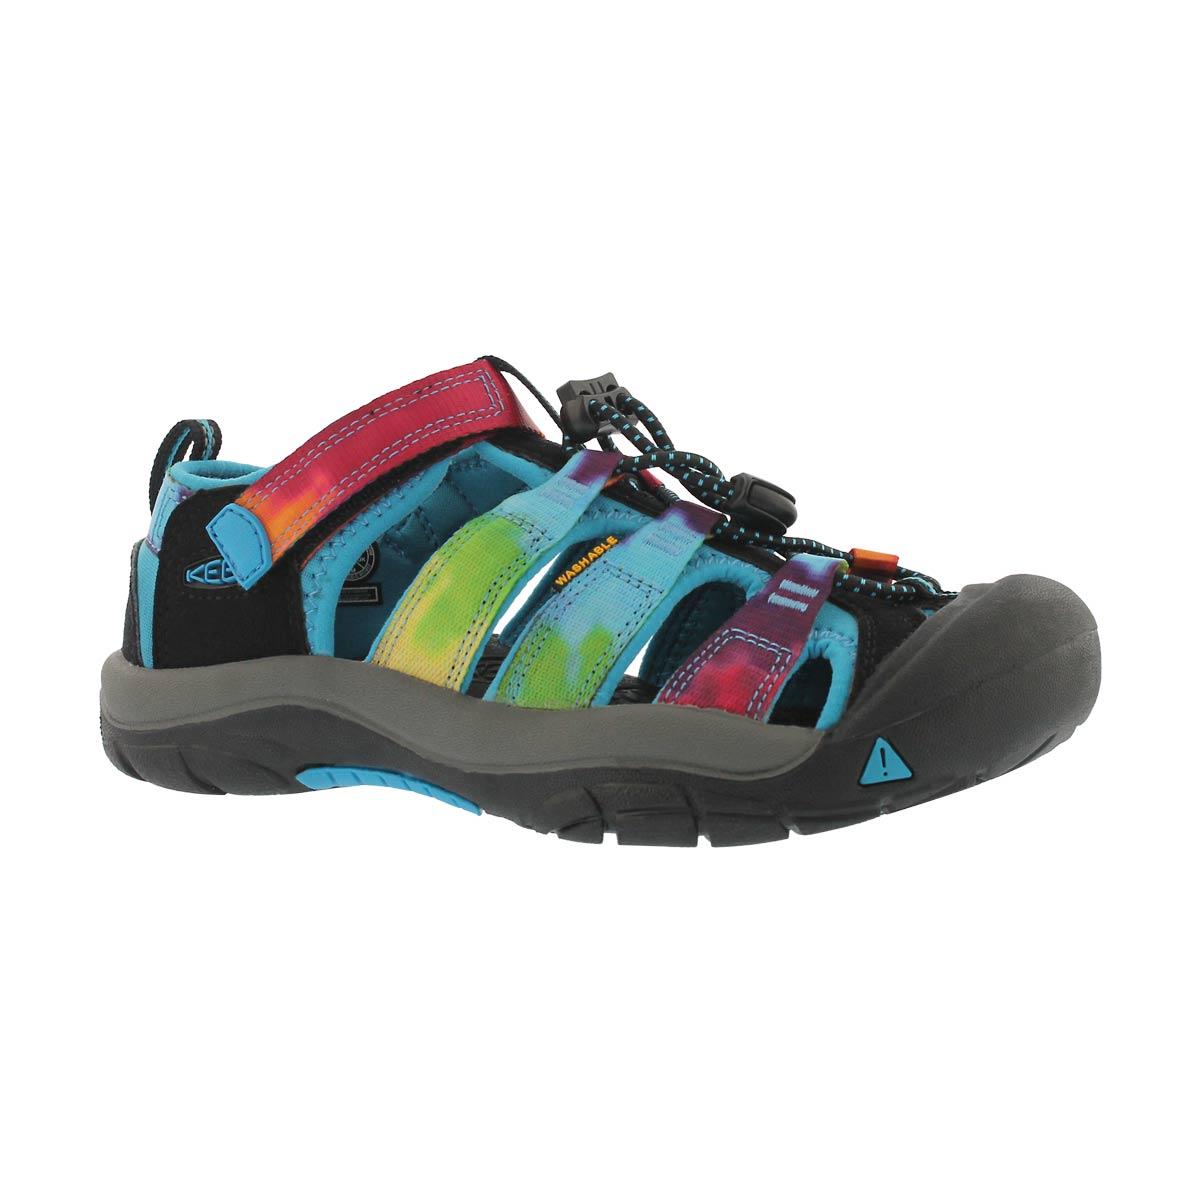 700c0c284b Keen Girls' NEWPORT H2 rainbow tie dye sandal   Softmoc.com